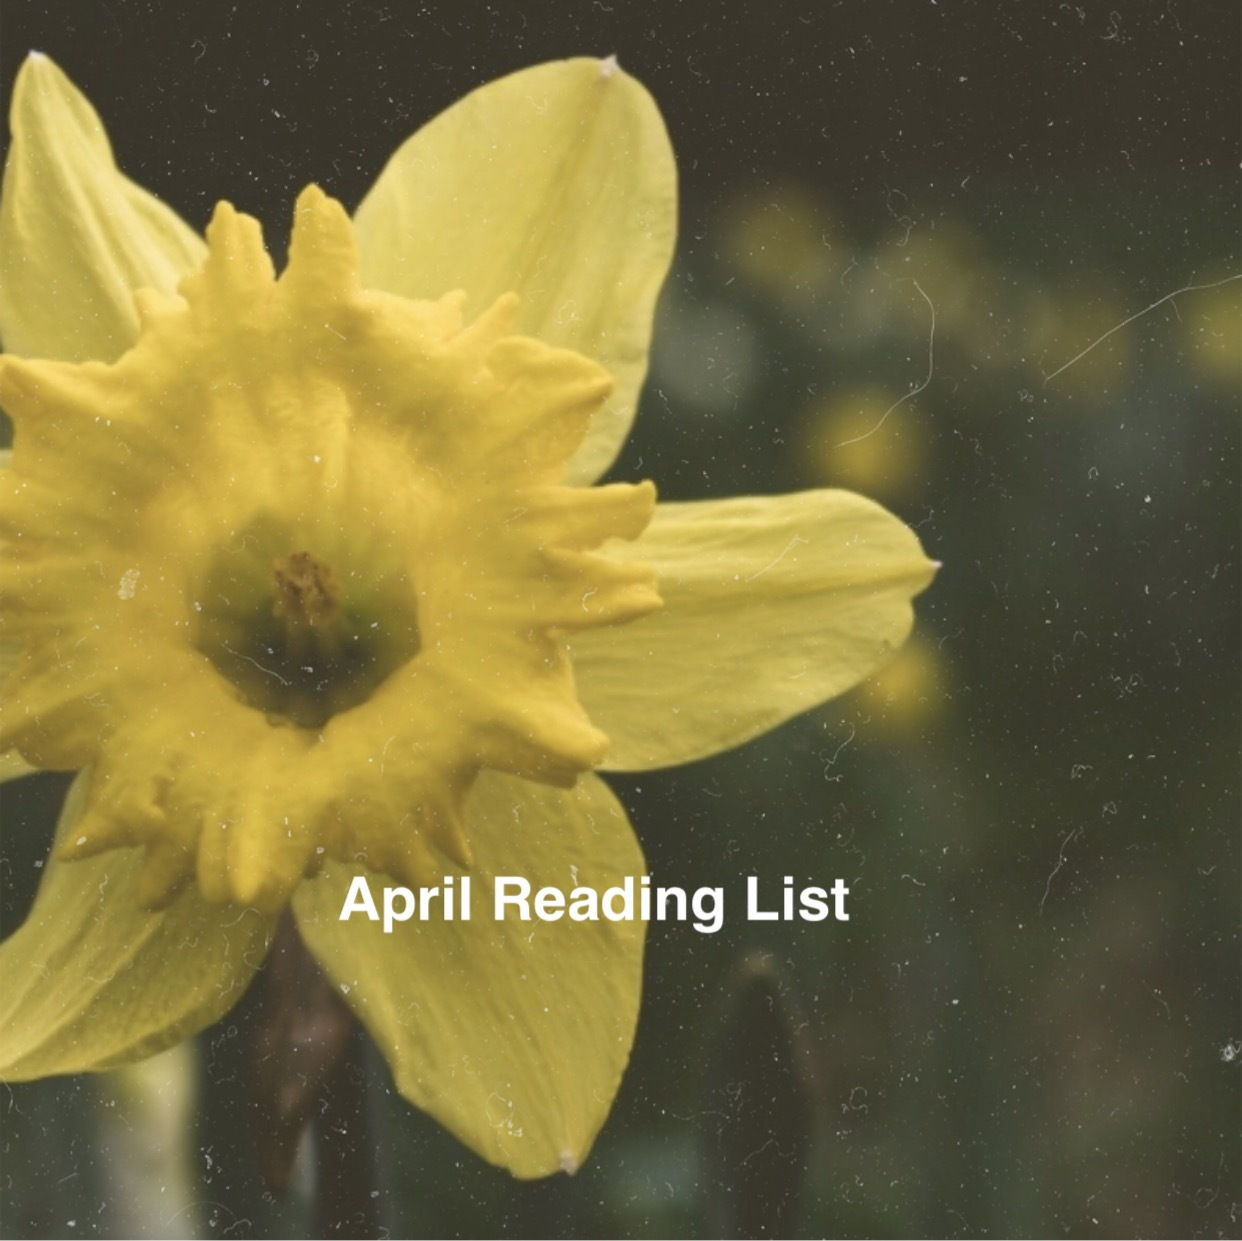 April Reading List